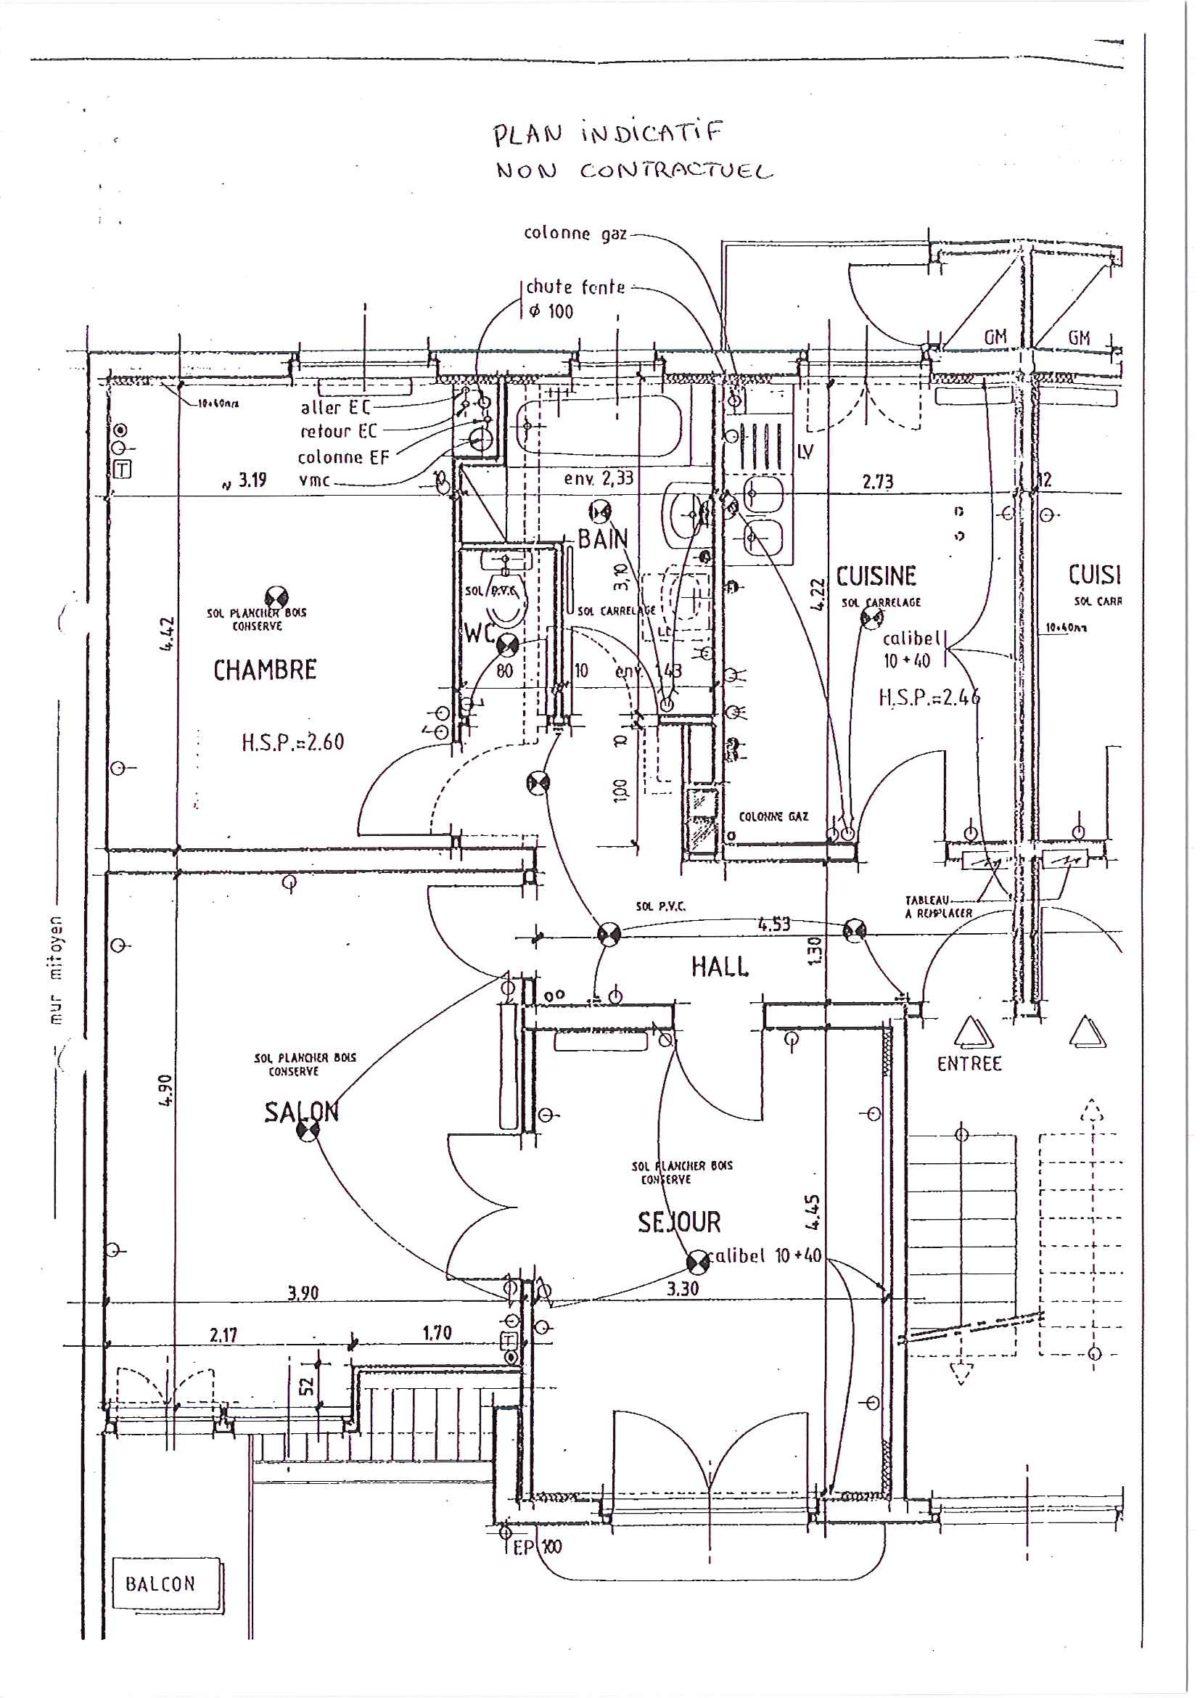 03800601 plan logement